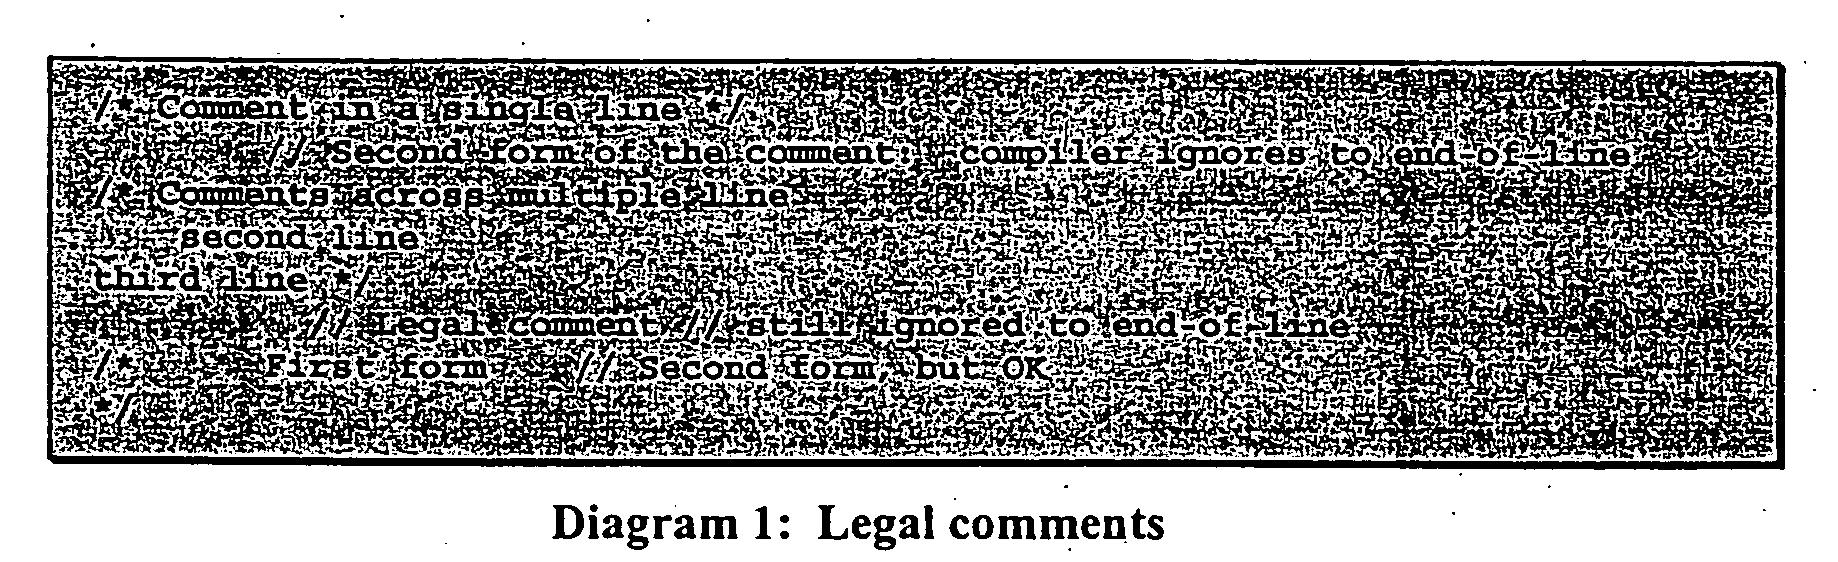 Figure US20040148382A1-20040729-P00001